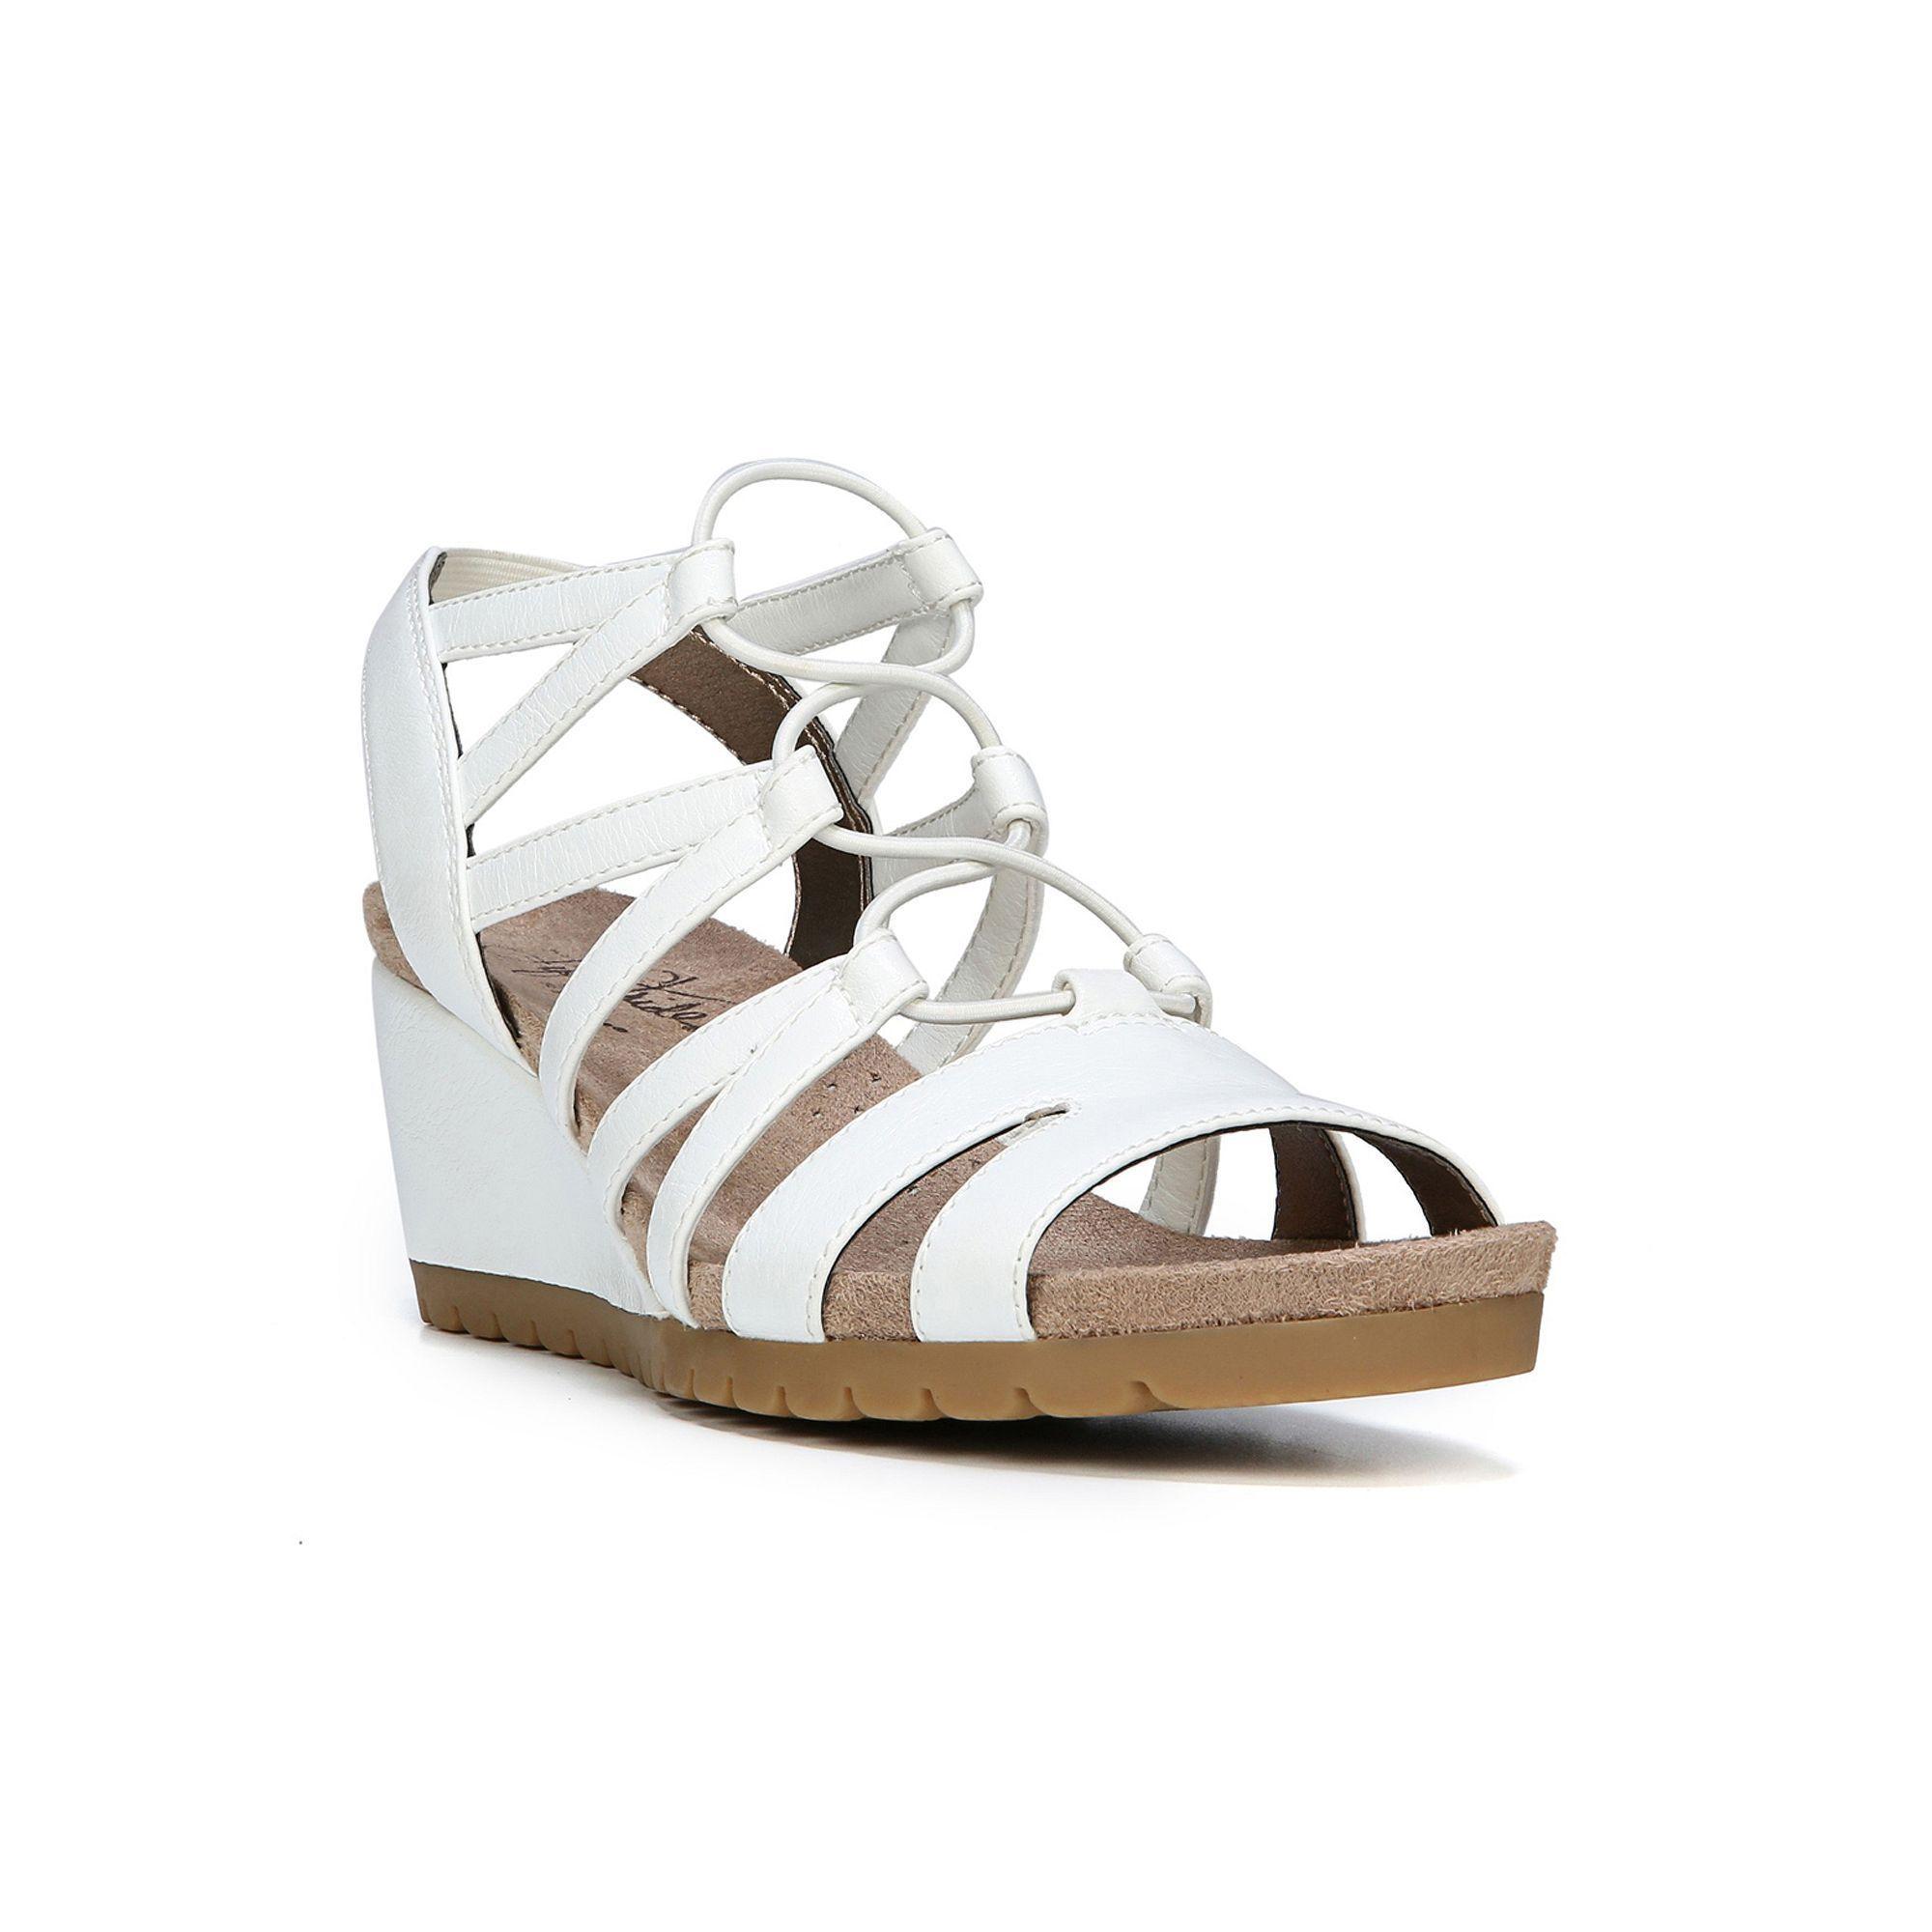 0f7f7d00426b1a LifeStride Nadira Women s Wedge Sandals